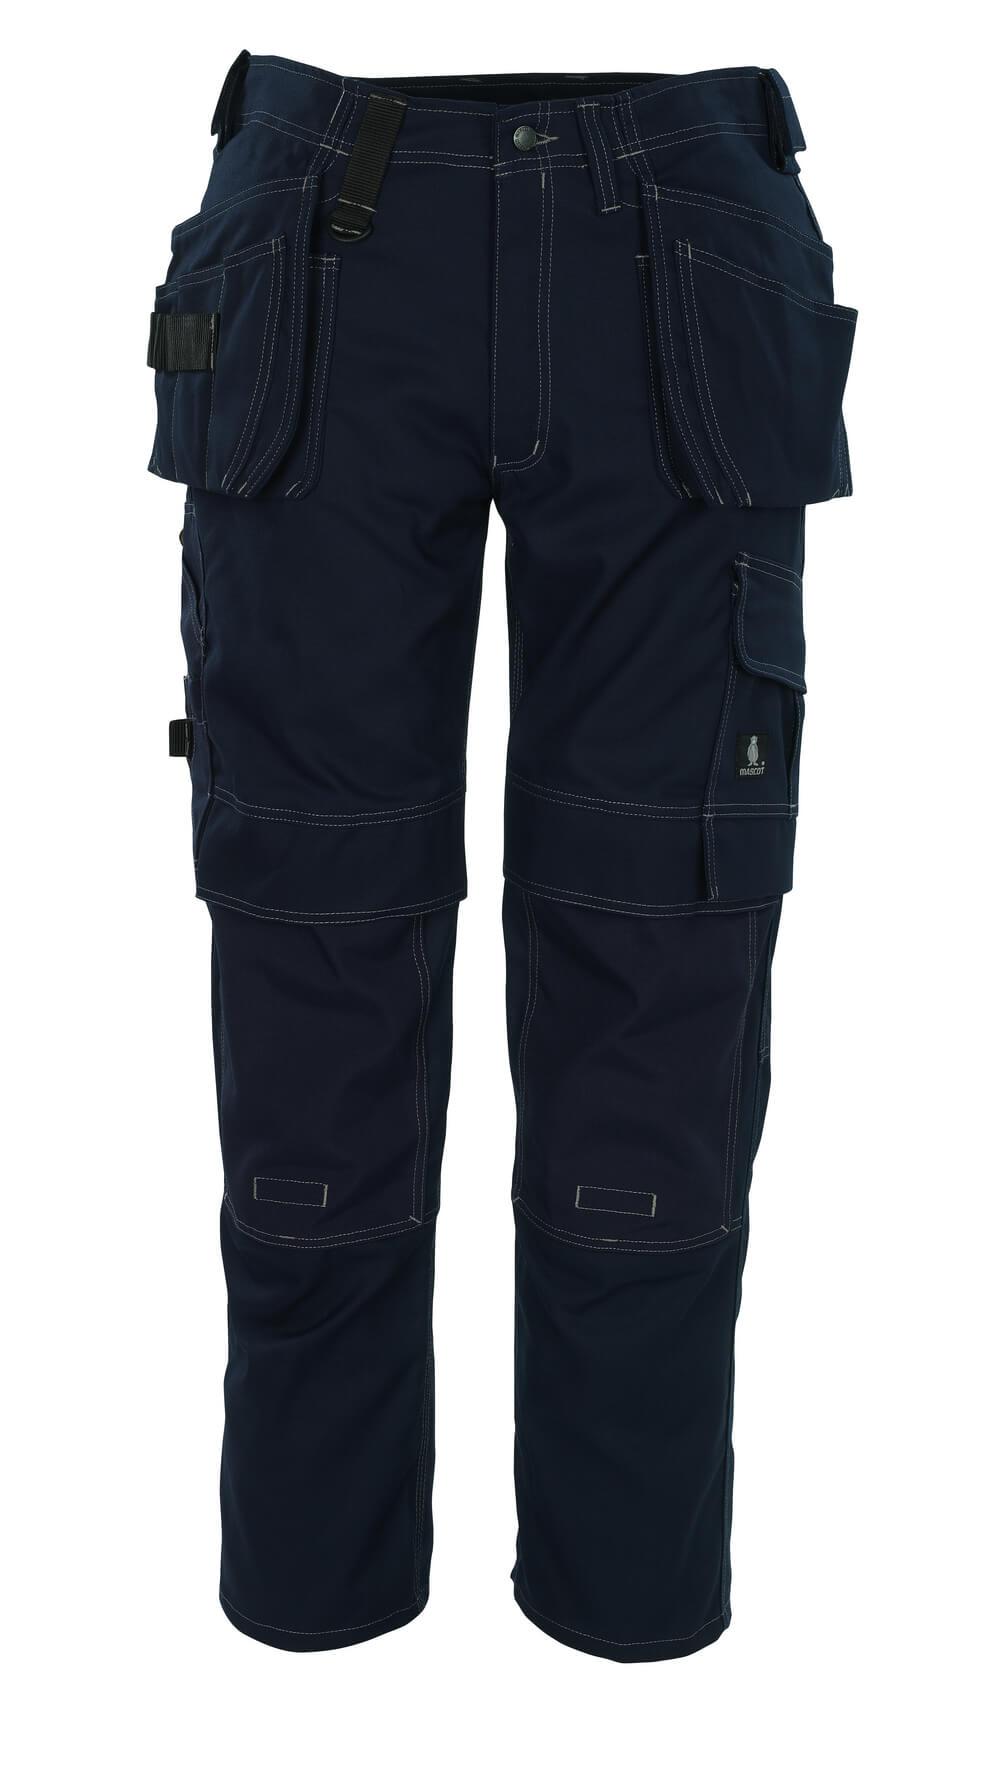 08131-010-01 Pantalon avec poches flottantes - Marine